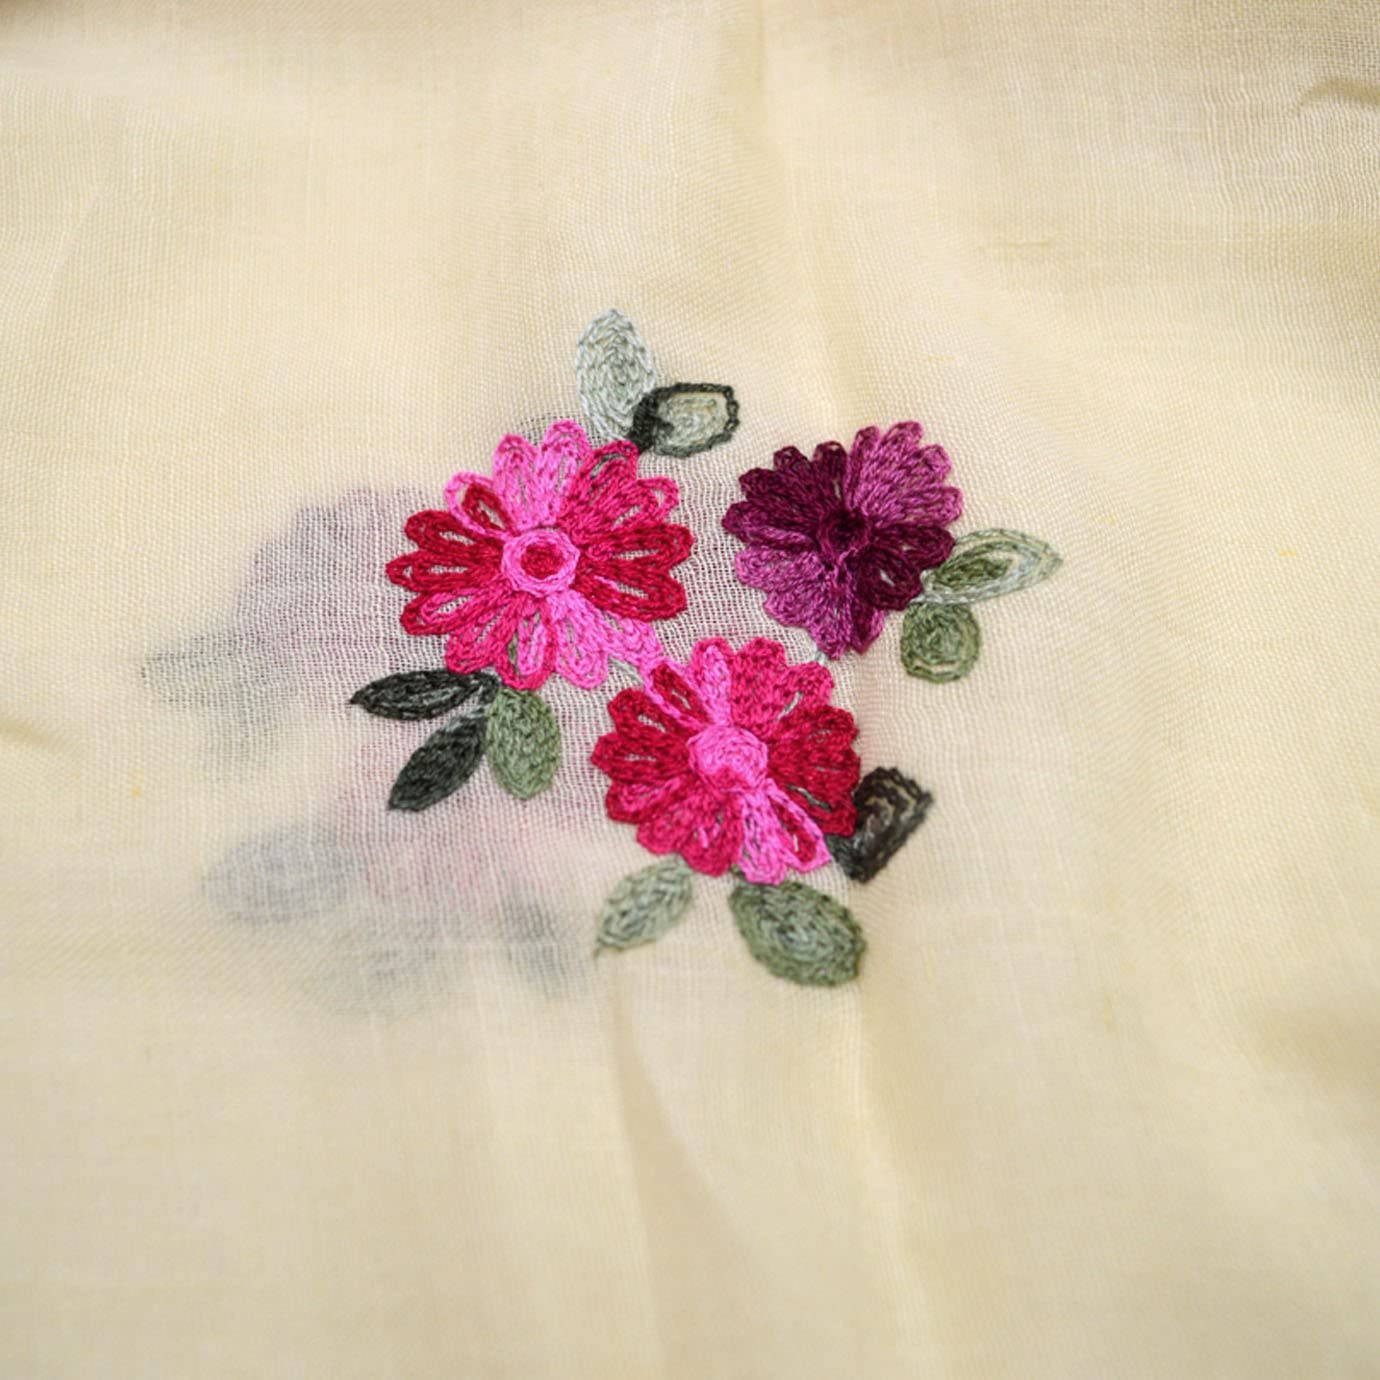 Monique Women Floral Embroidery Scarf Spring Autumn Long Scarf Summer Beach Shawl Wrap